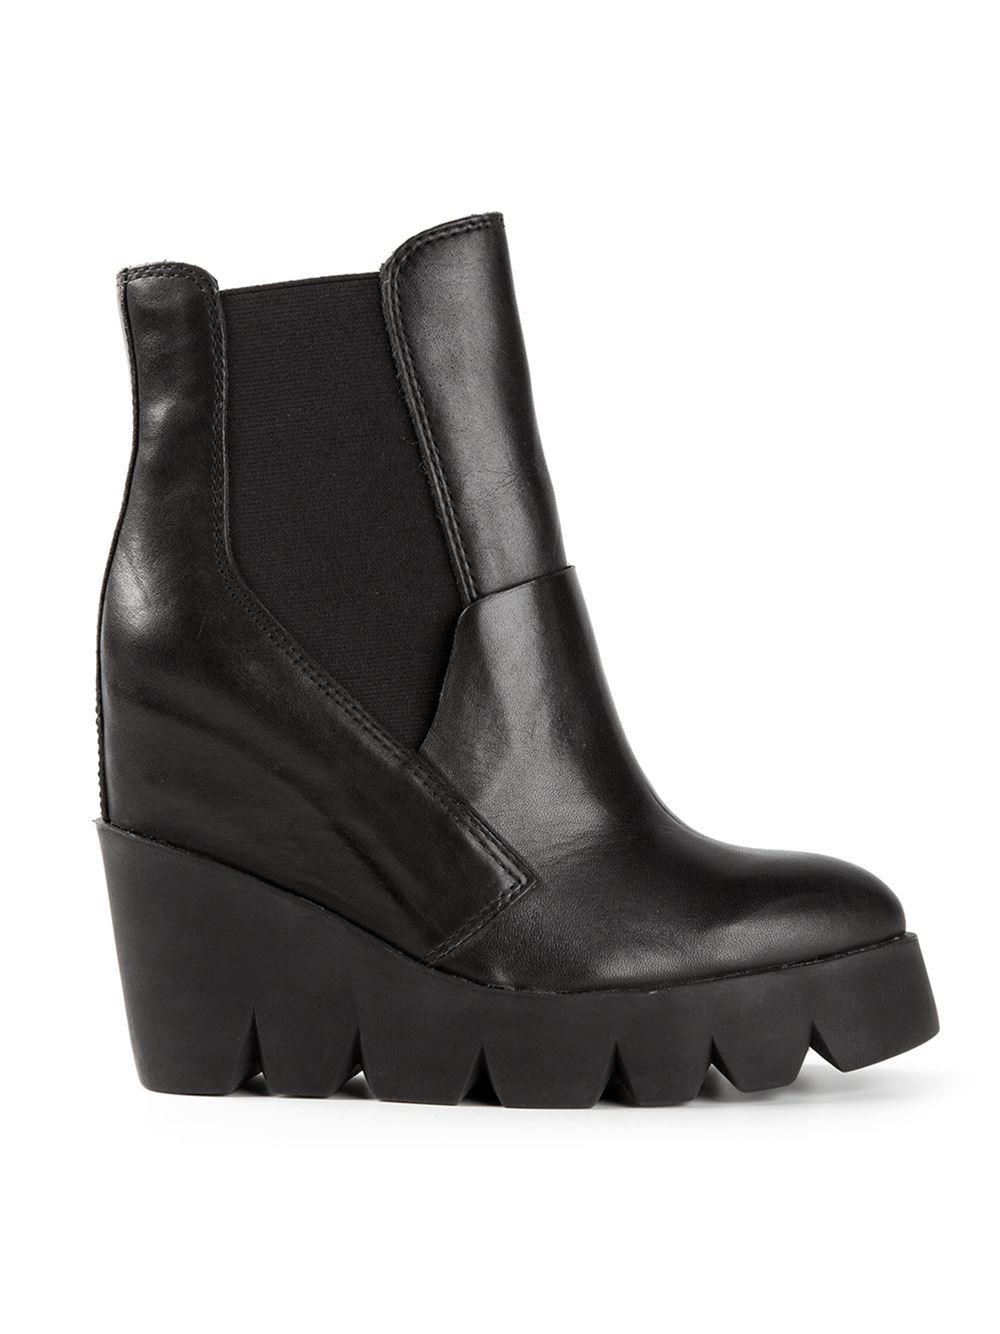 51c2ce3b6711 koi footwear Black Chunky Platform Chelsea Boots - Ecosia